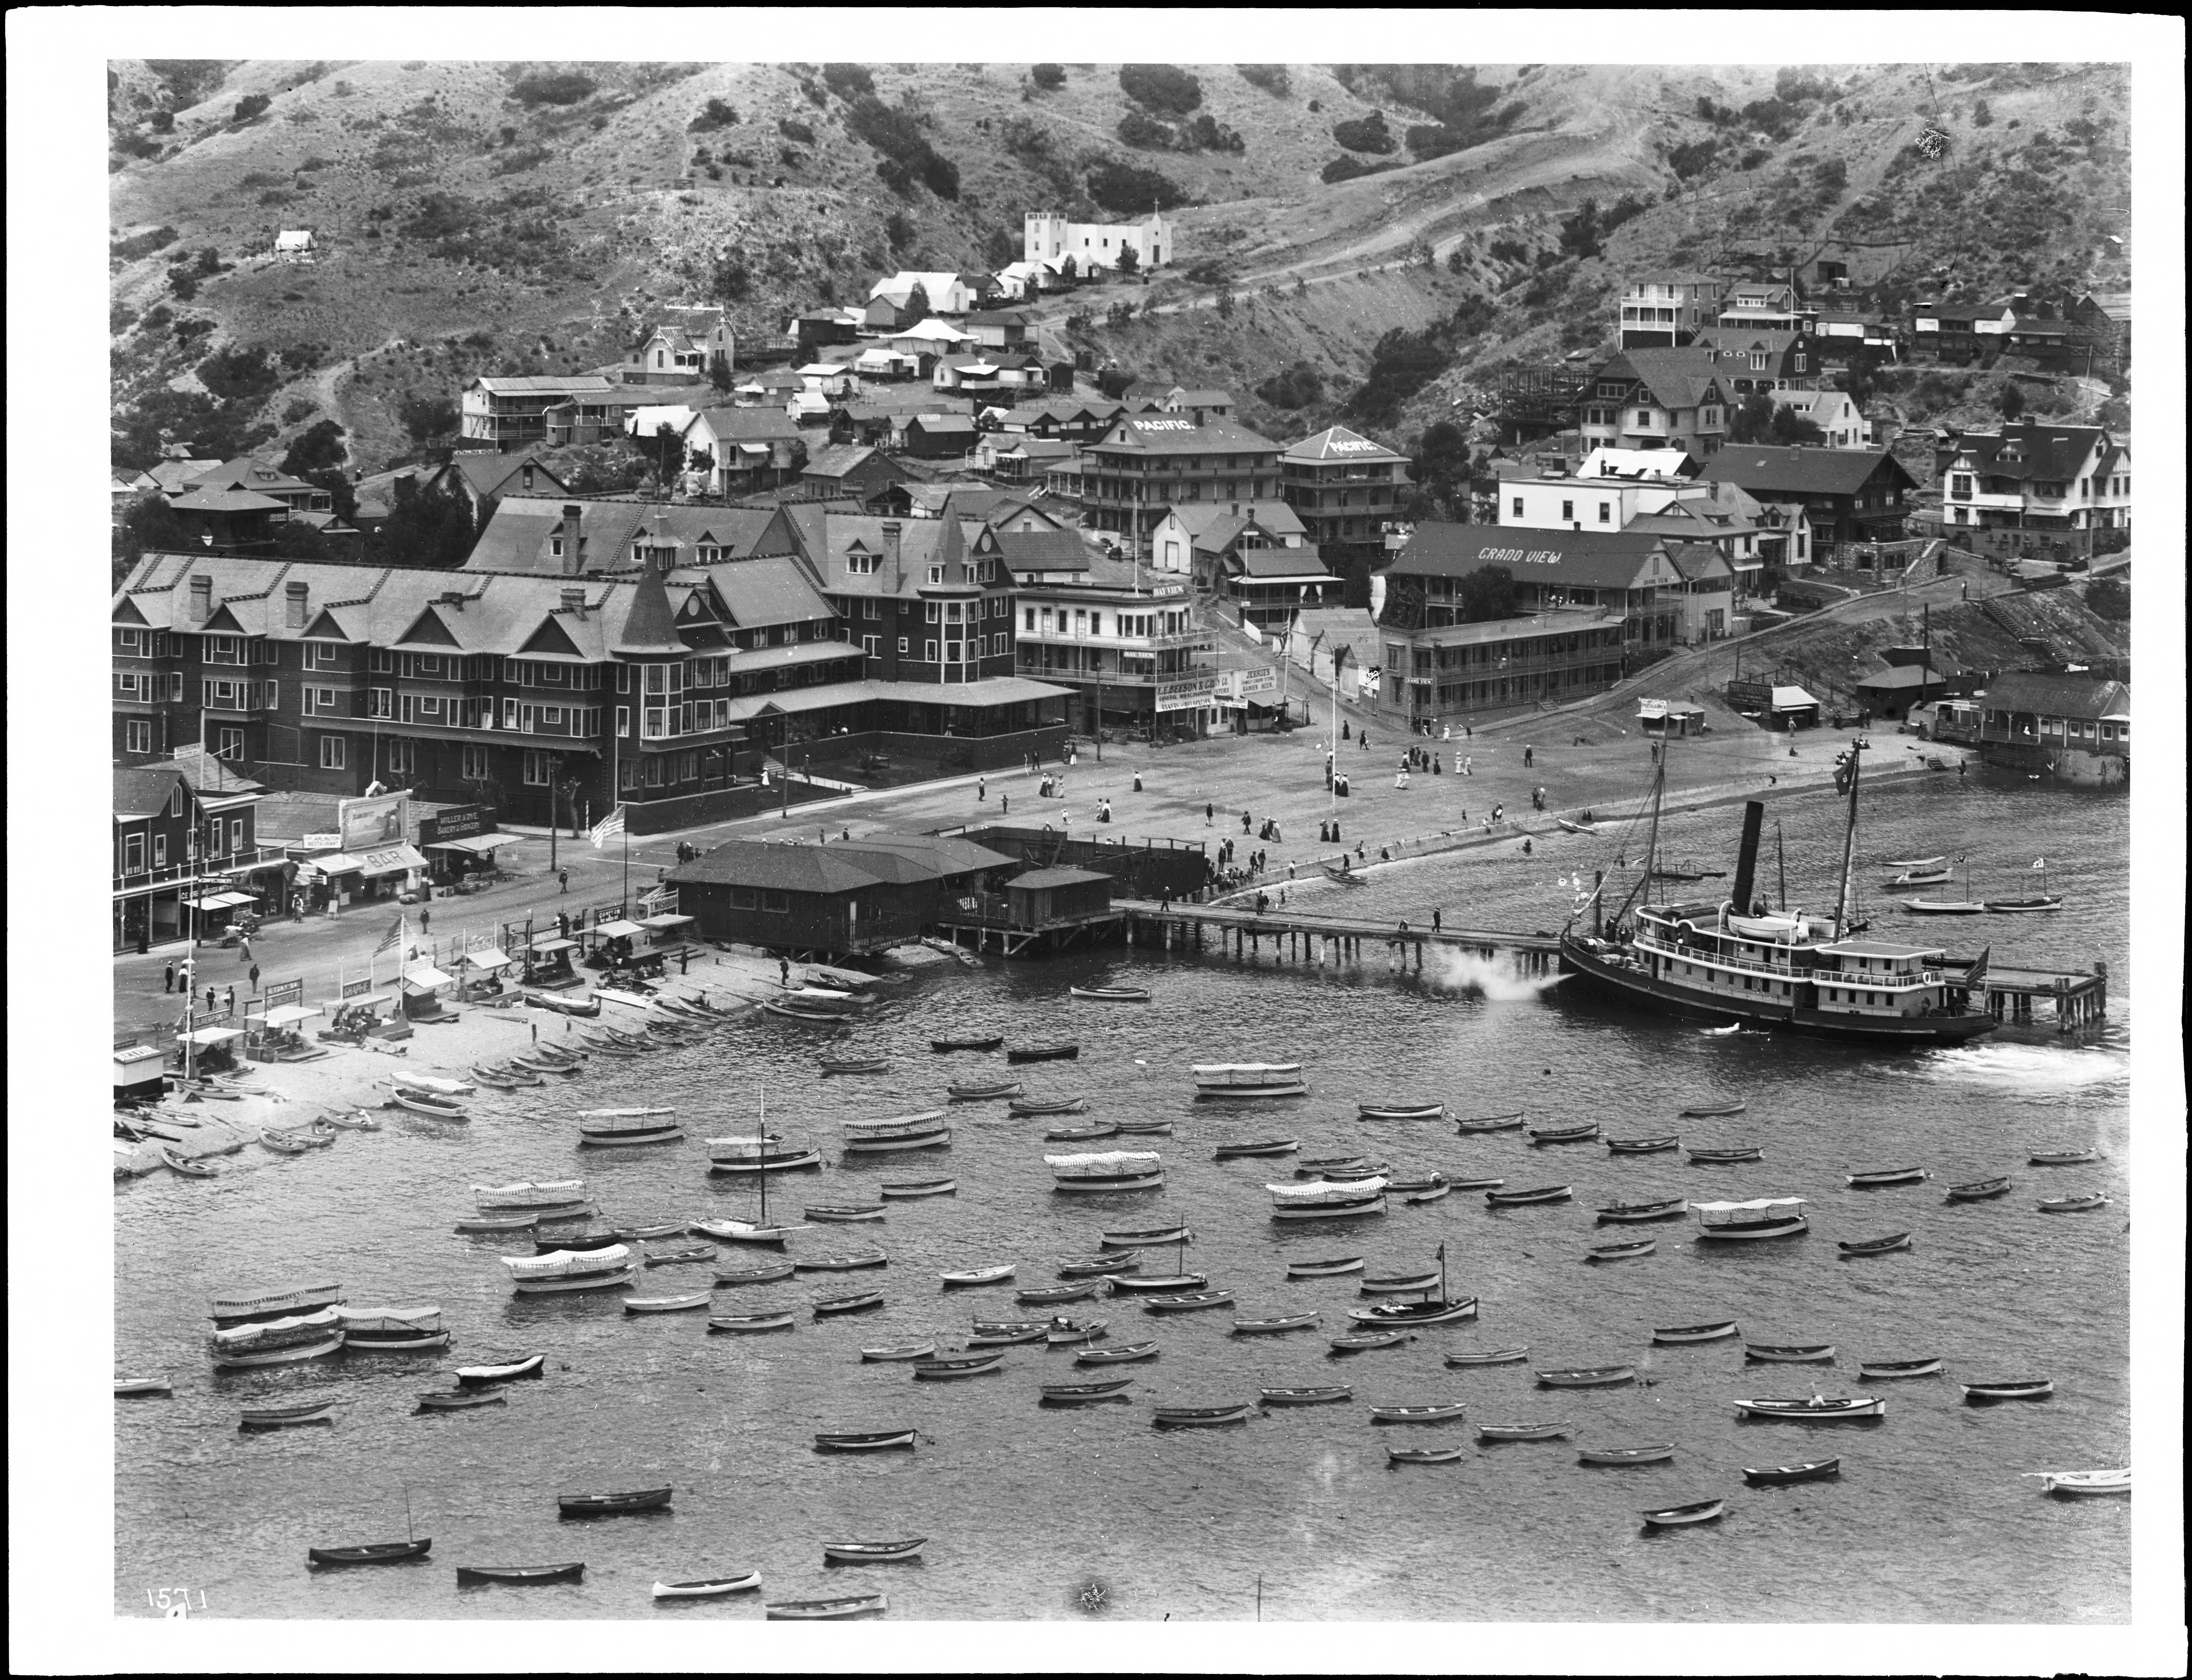 FileTown Of Avalon On Santa Catalina Island With New